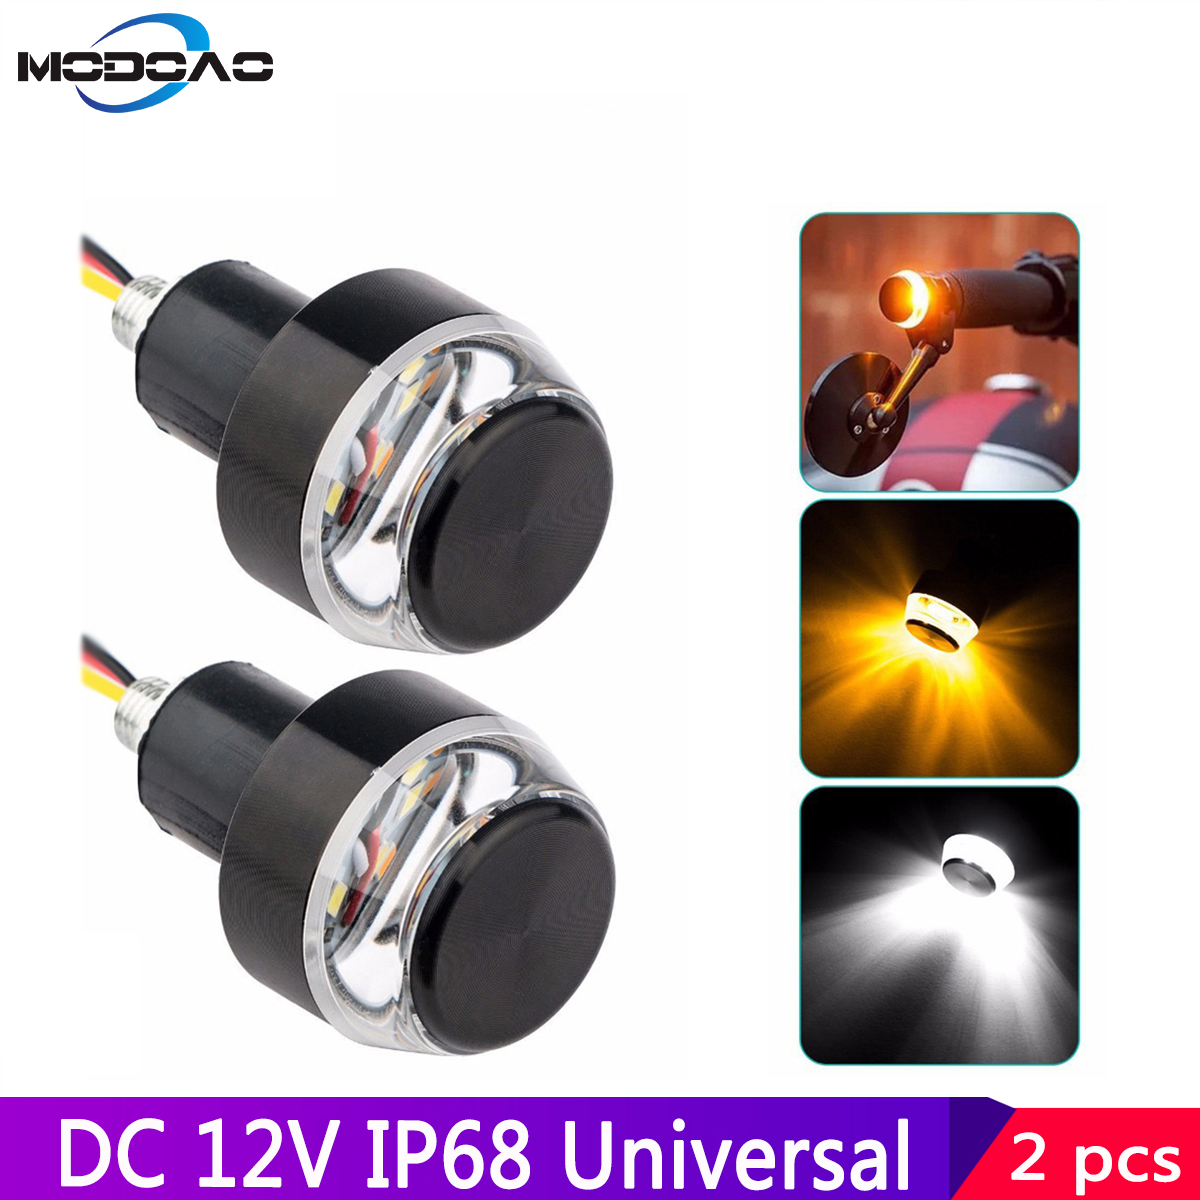 2pcs LED Motorcycle Handlebar End Signal Lights Indicator Flasher 22mm Marker Lamp Universal Grip Side Direction Light